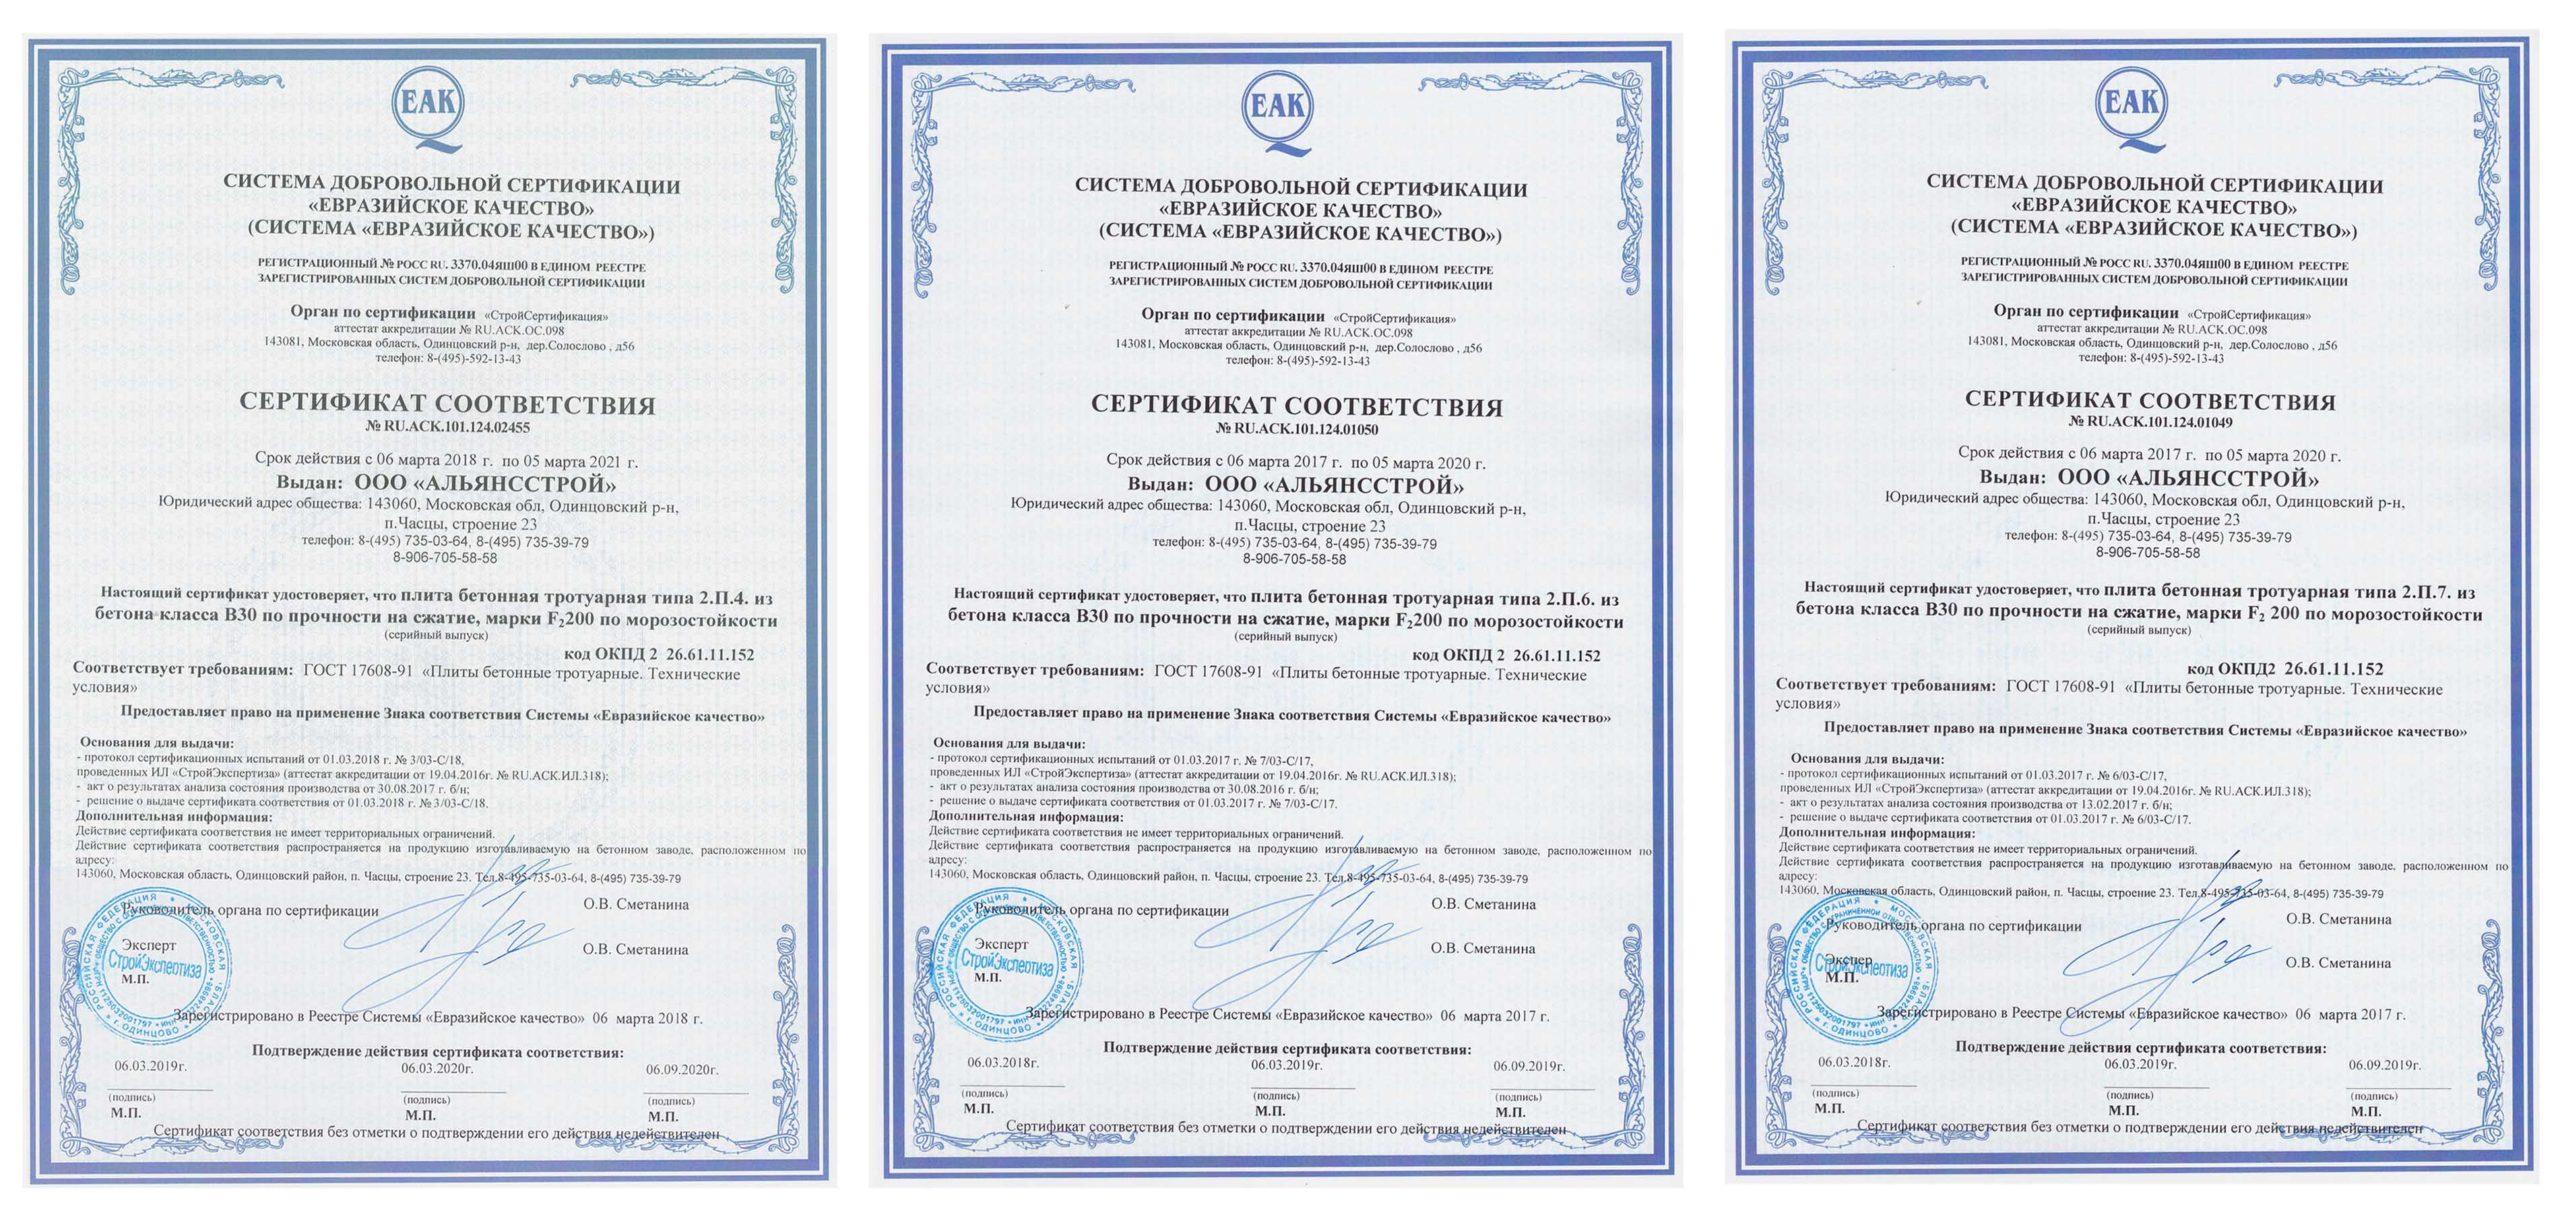 сертификаты на брусчатку, сертификаты альянсстрой